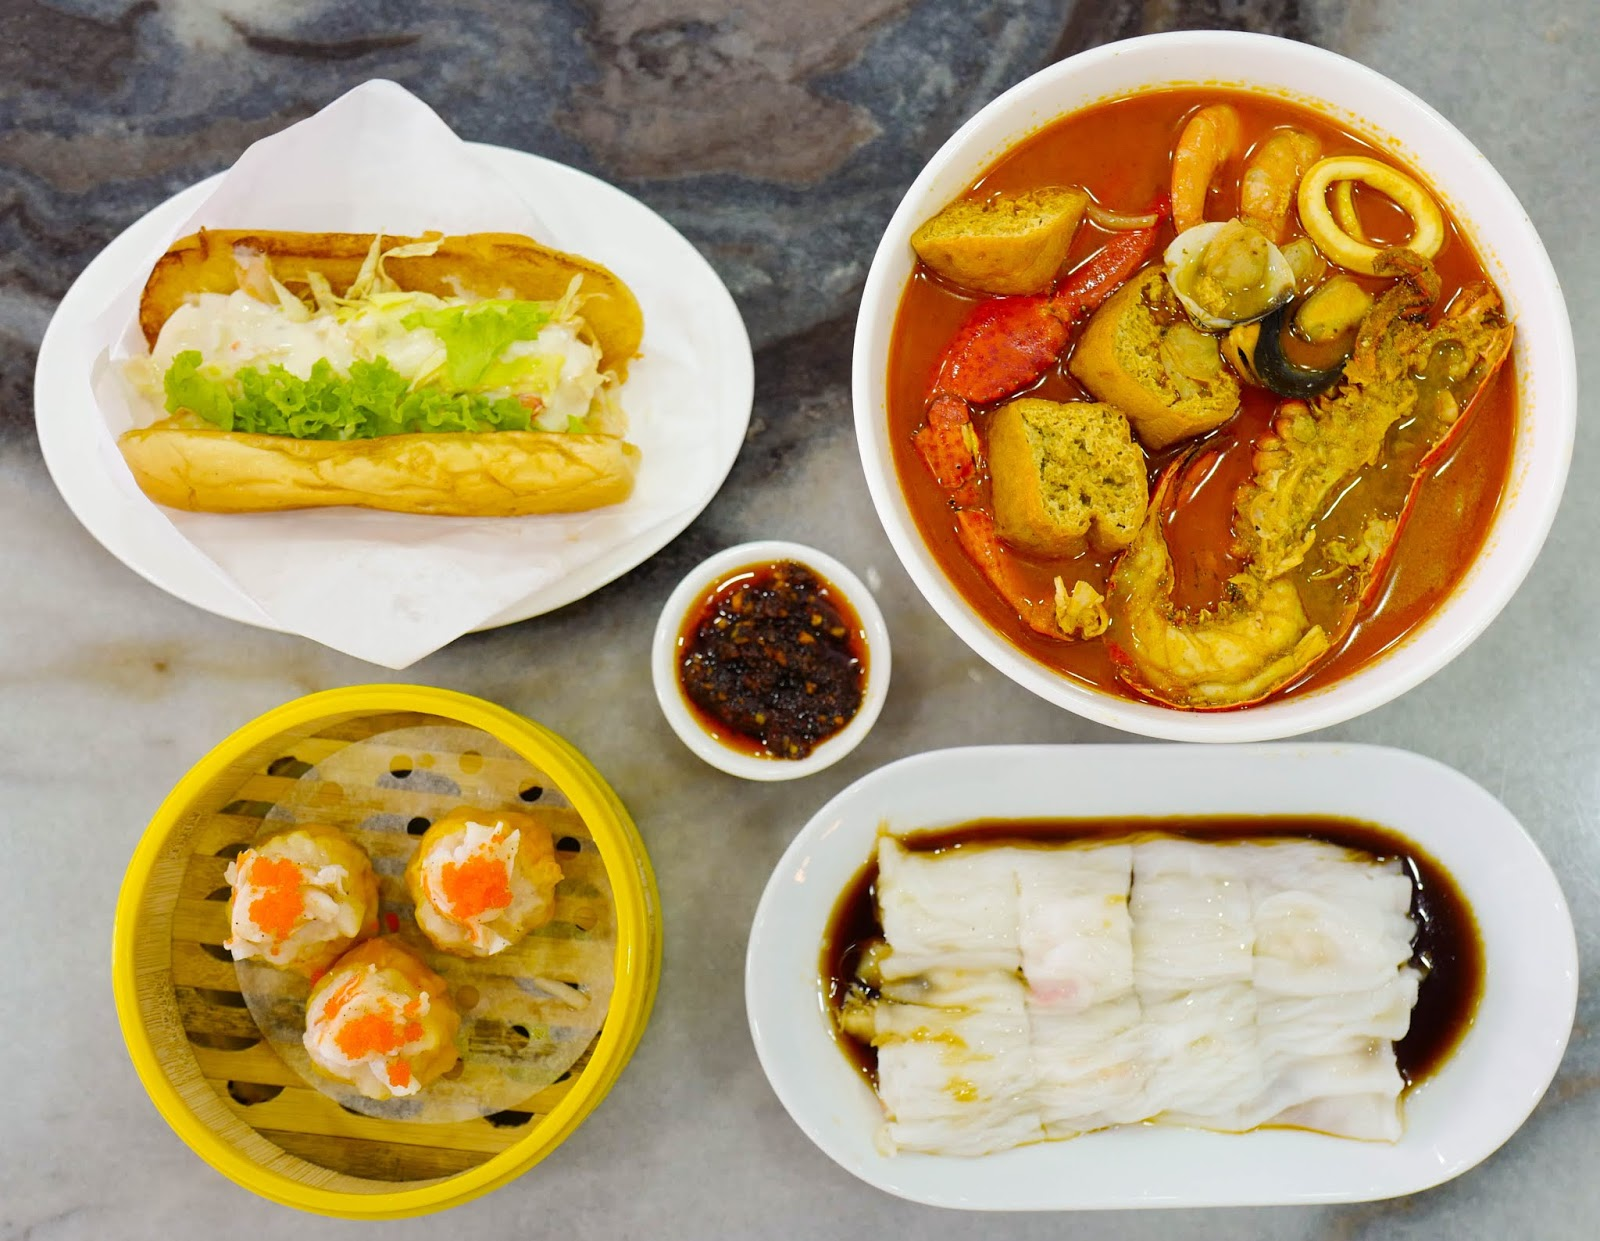 Hoi Kee Lobster & DimSum House, Segambut